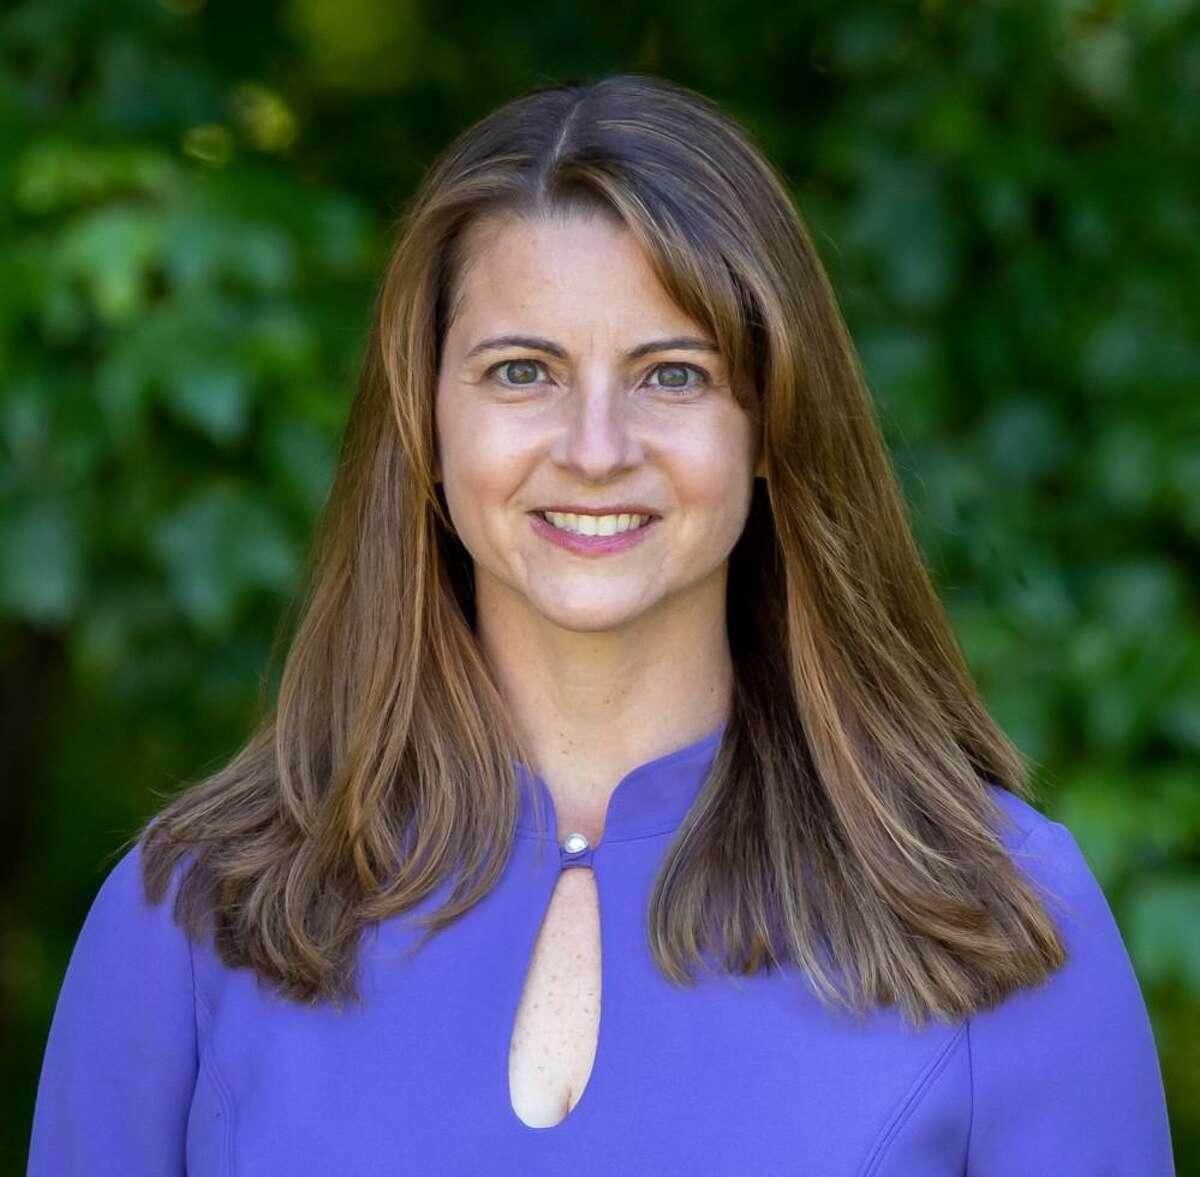 State Rep. Christie Carpino, R-Cromwell